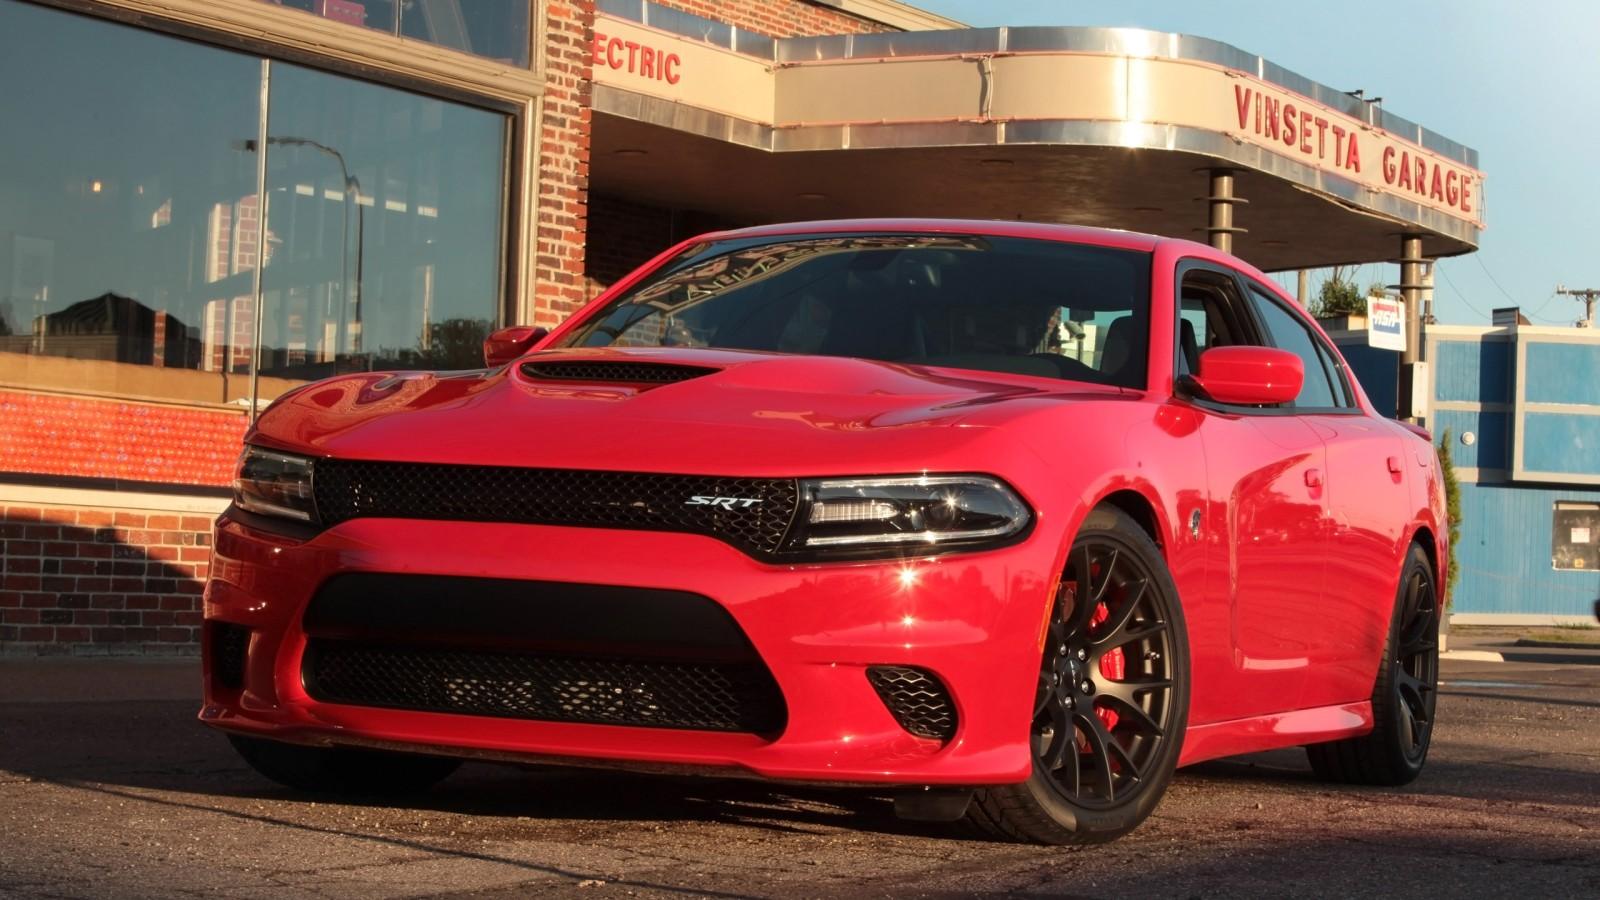 Dodge Challenger Car Wallpaper 2015 Dodge Charger Srt Hellcat 2 Wallpaper Hd Car